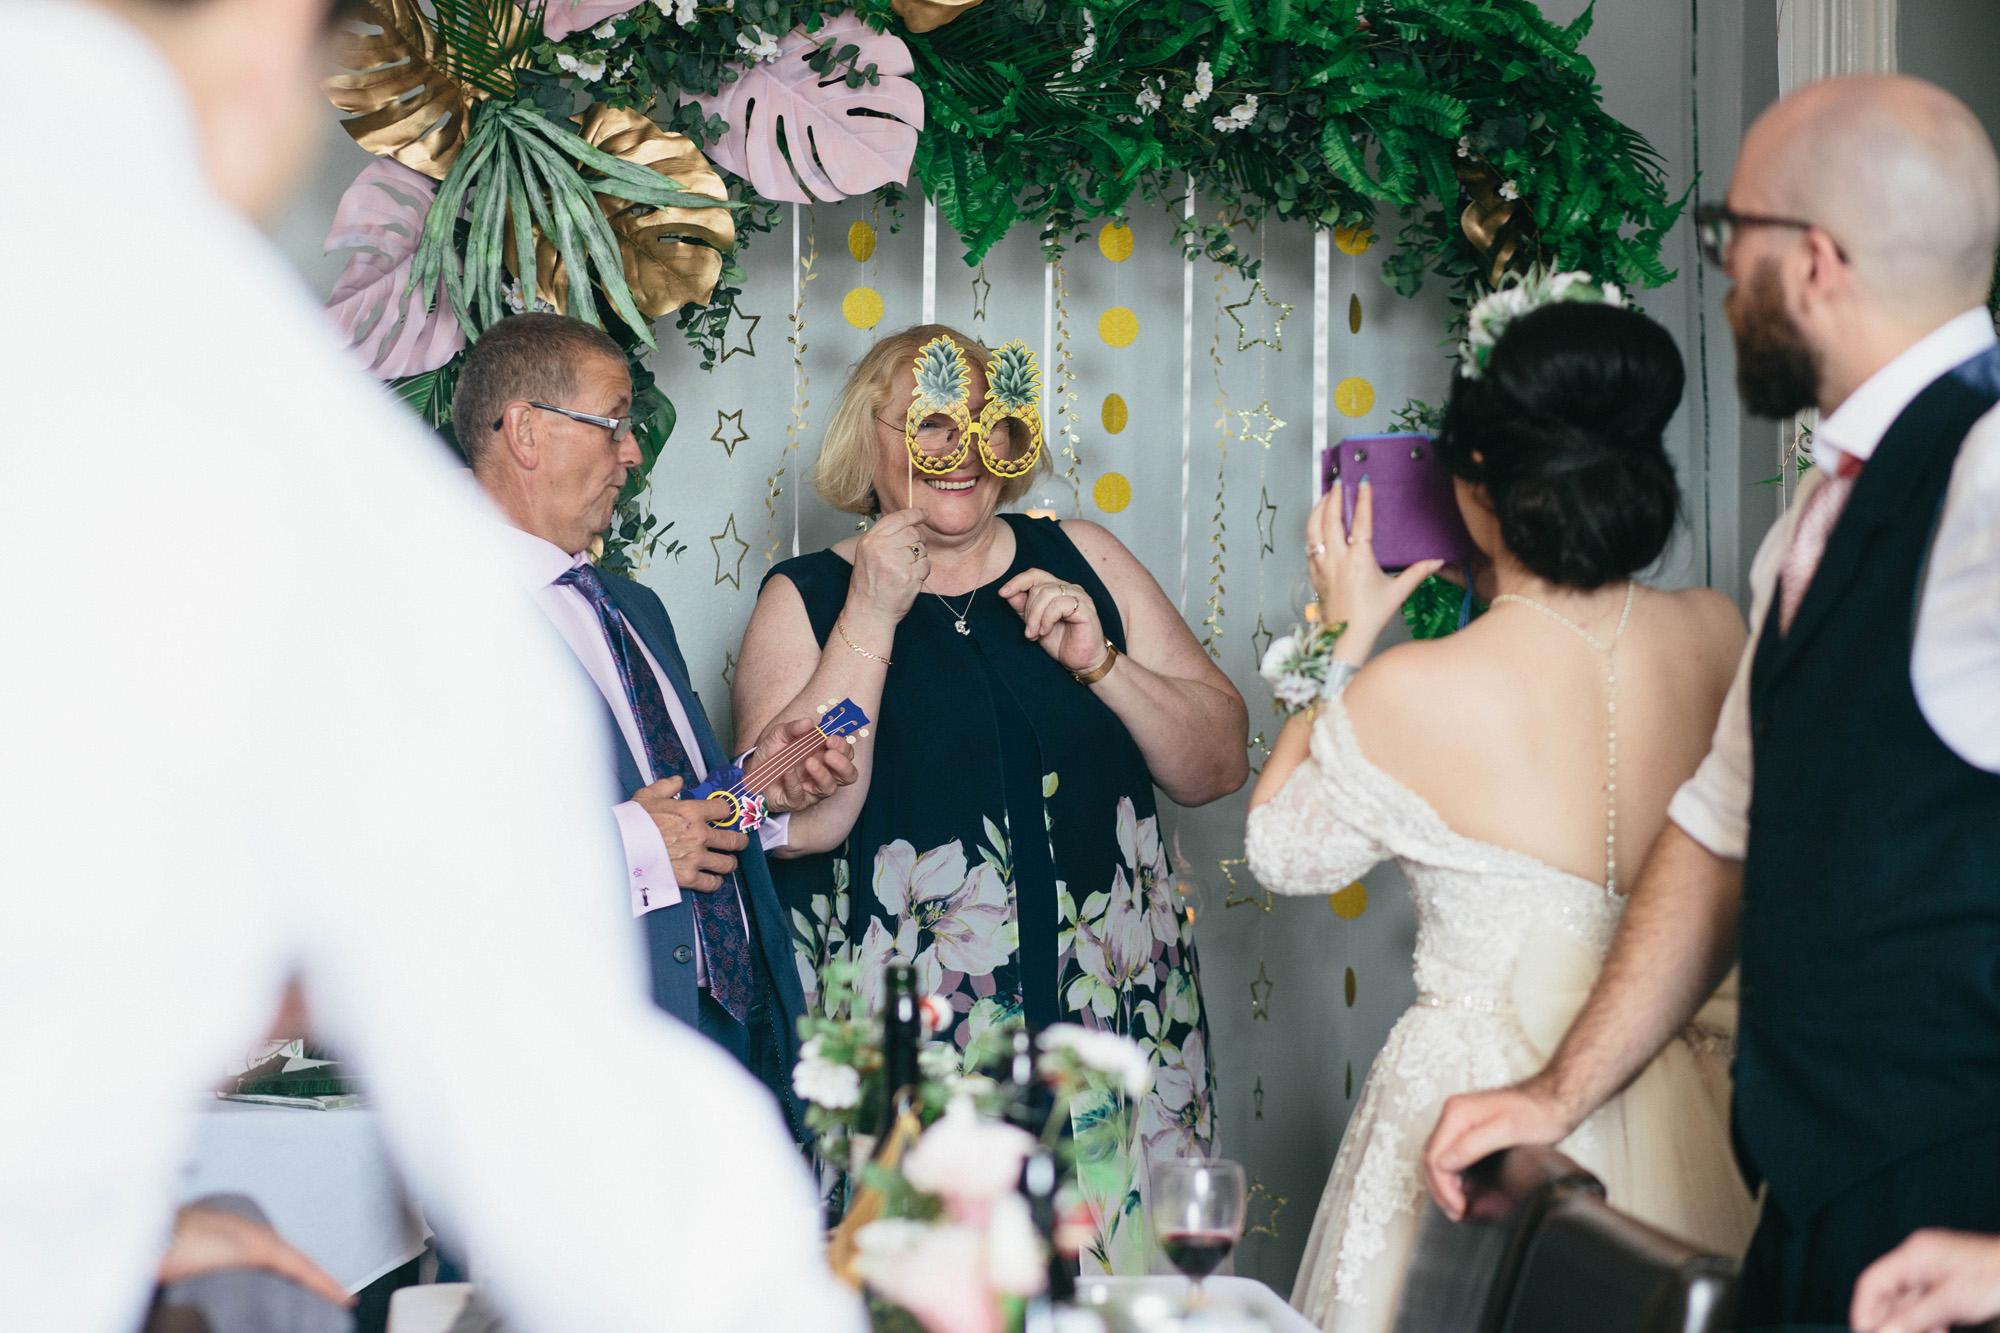 Quirky Wedding Photography Glasgow West End 051.jpg